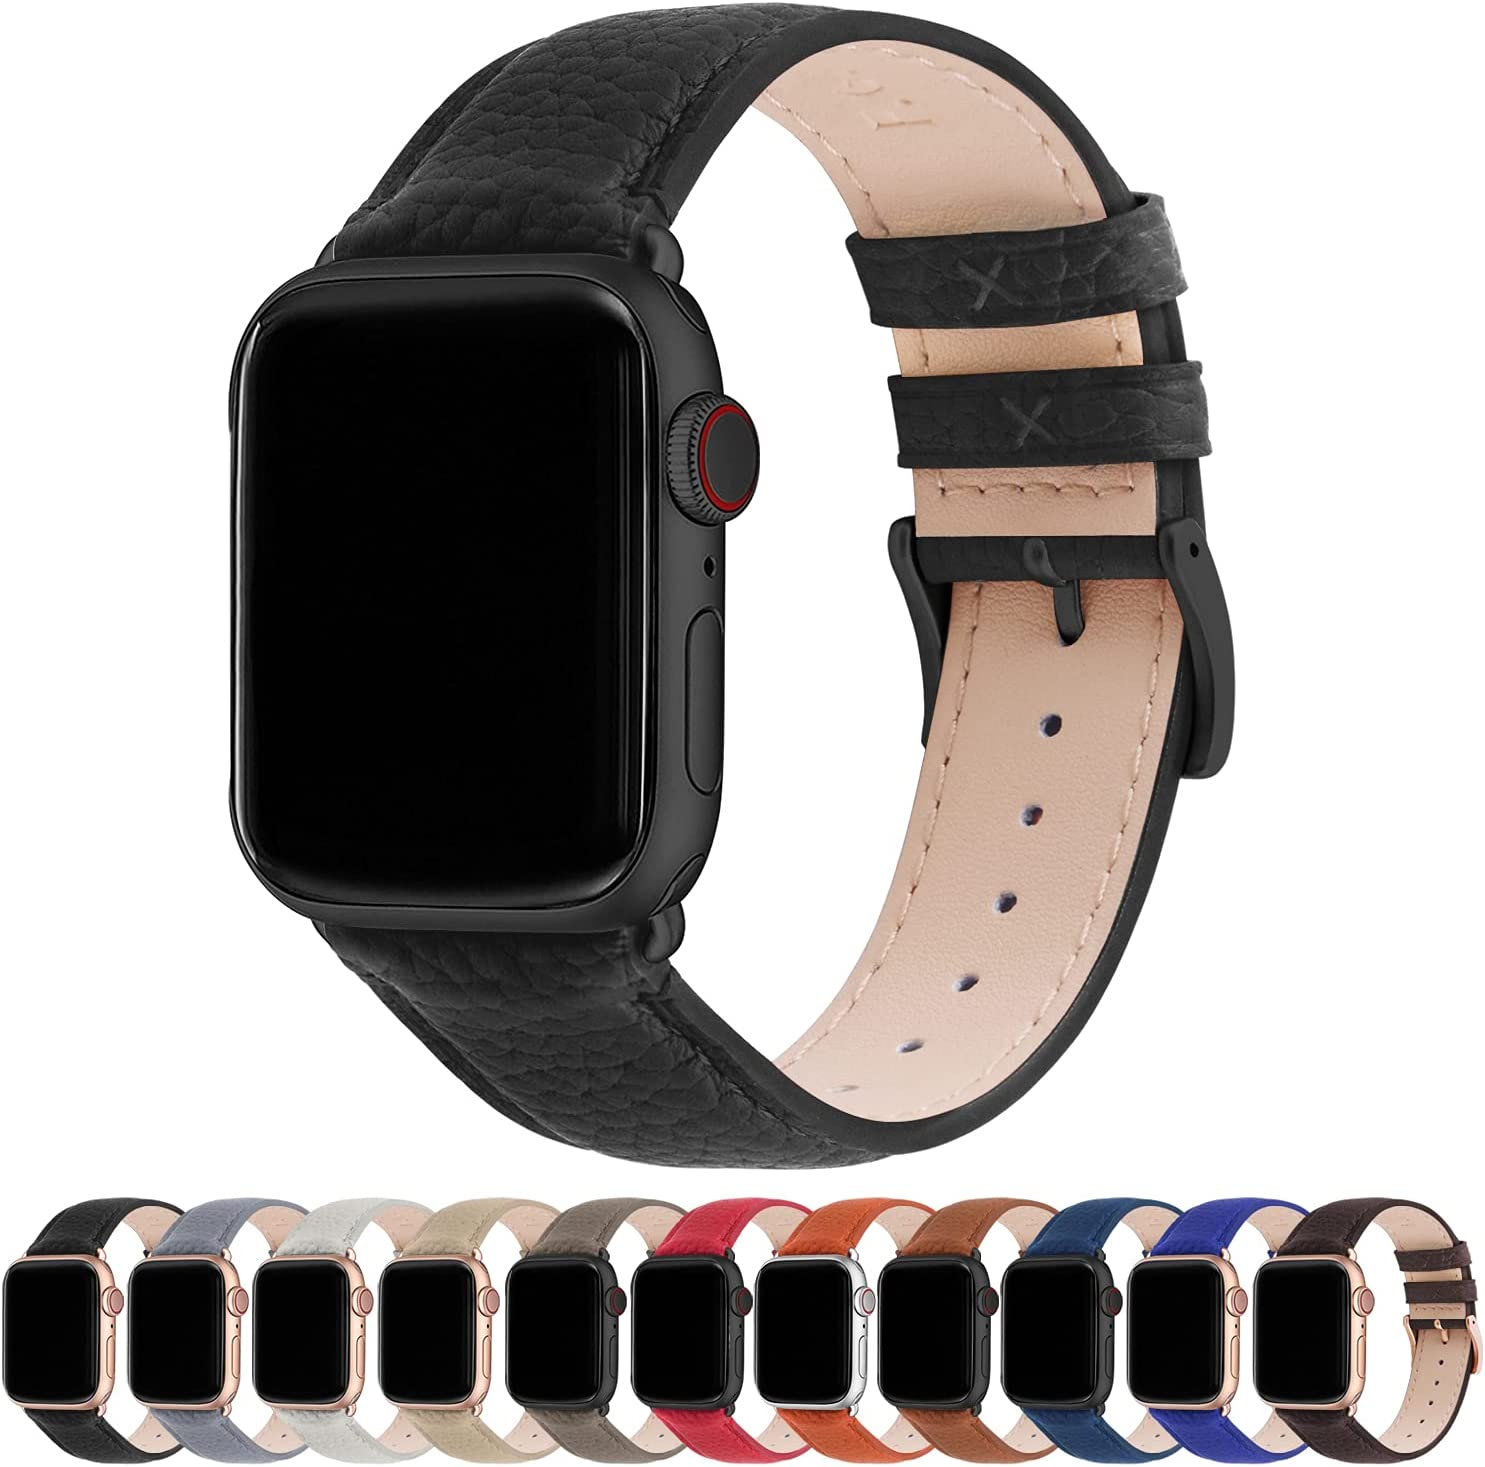 Fullmosa Compatible Apple Watch Band 44mm 42mm 40mm 38mm Leather Compatible iWatch Band/Strap Compatible Apple Watch SE & Series 6 5 4 3 2 1, 38mm 40mm, Black + Gunmetal Buckle